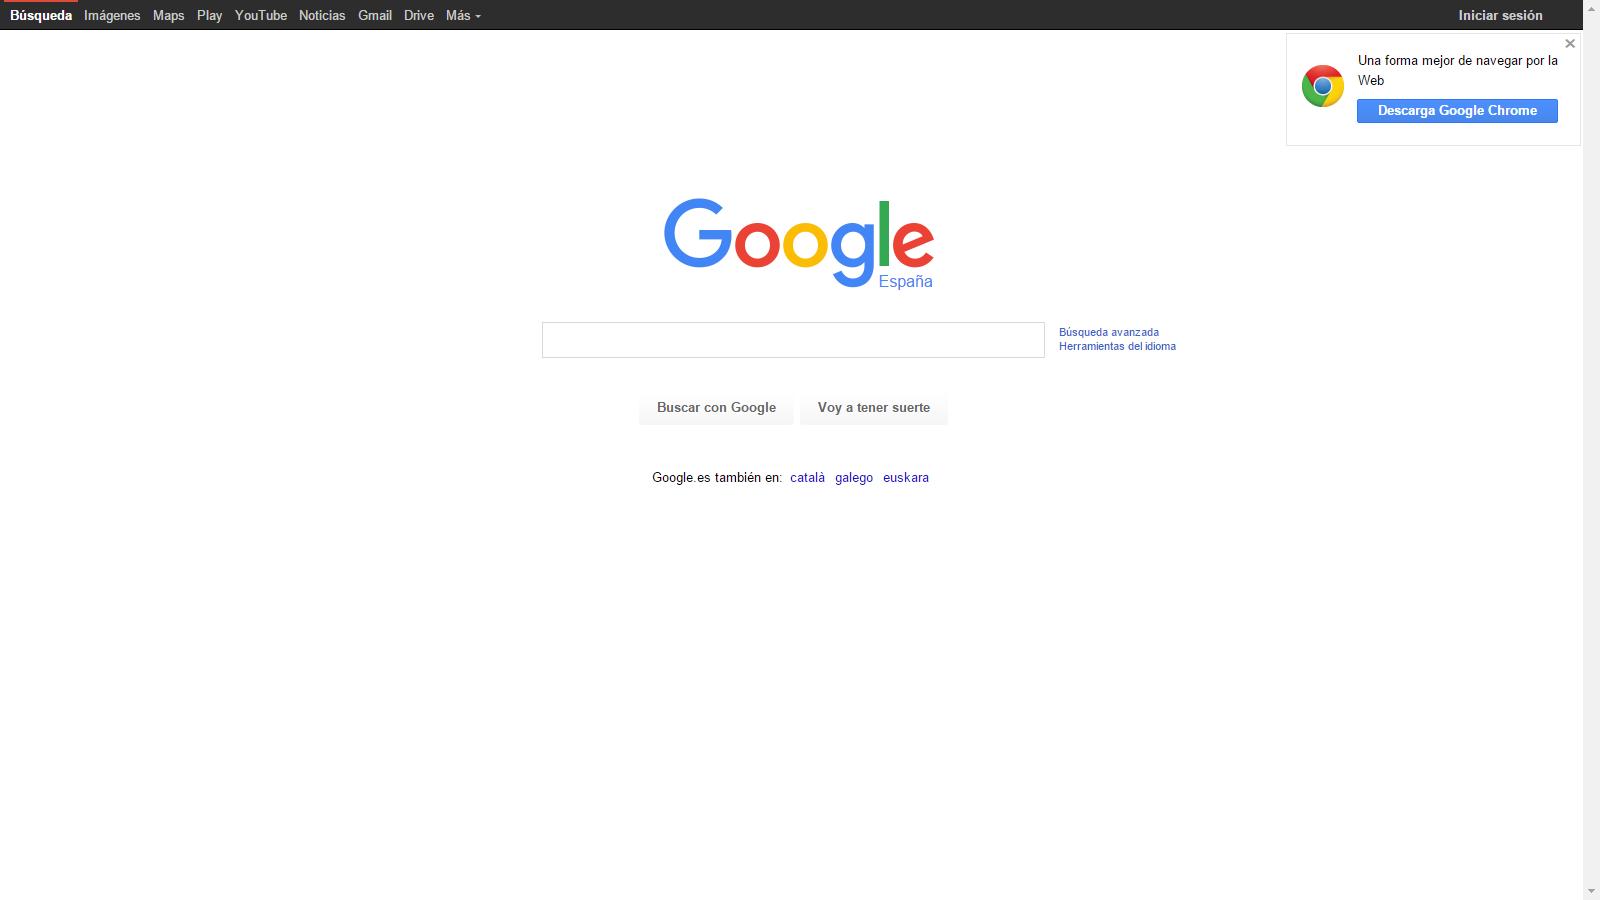 Sitio web de Google suplantado